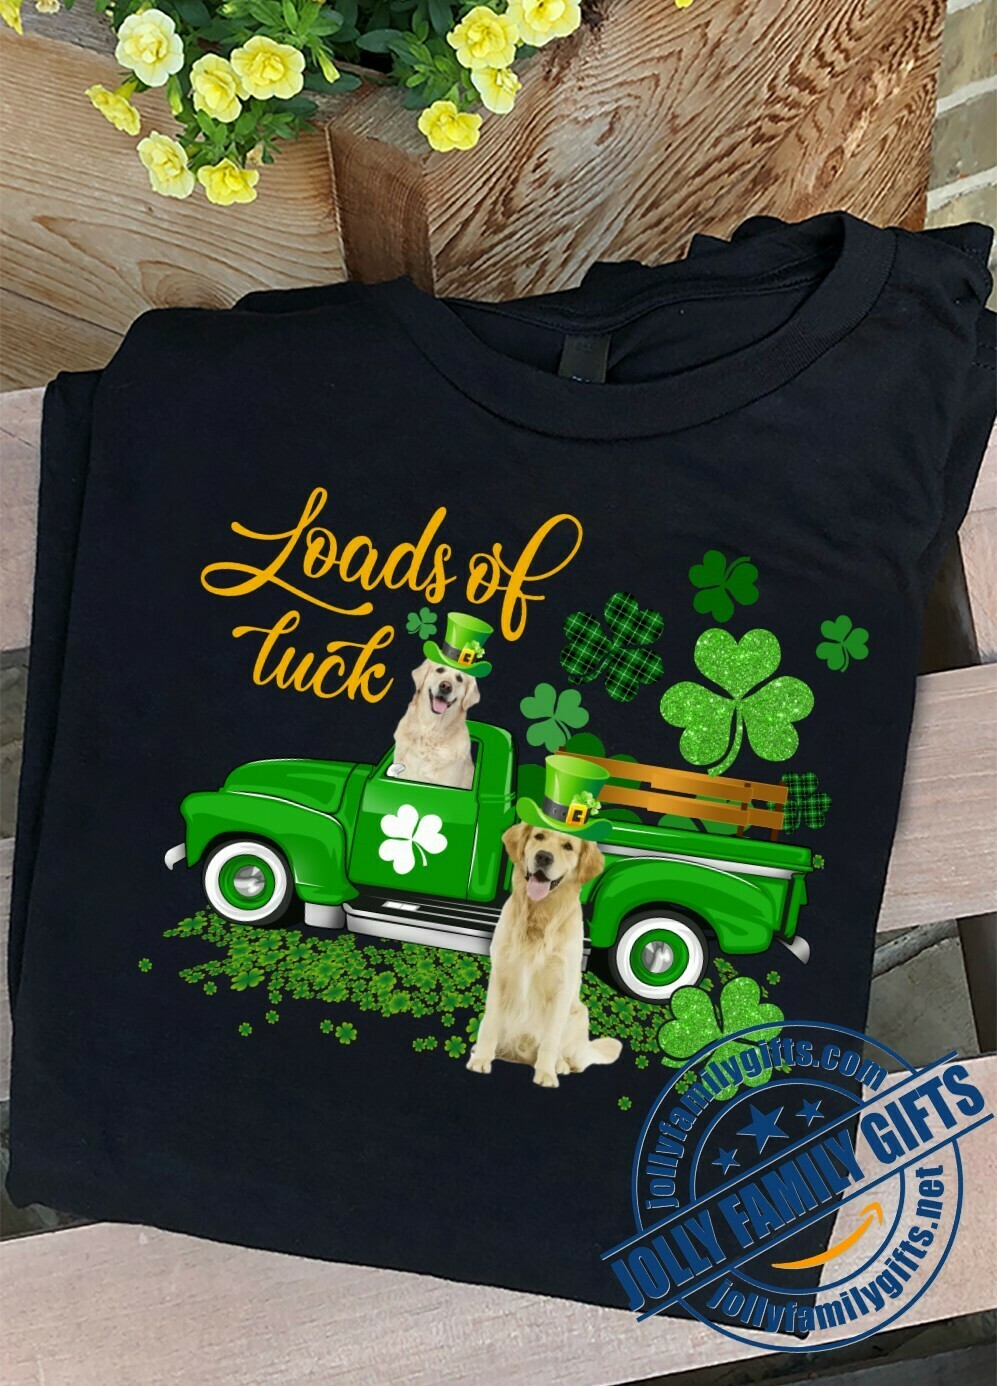 Loads Of Luck Truck Bullmastiff Irish Dog Leprechaun St Patricks Day Gift Idea for Men Women Unisex T-Shirt Hoodie Sweatshirt Sweater Plus Size for Ladies Women Men Kids Youth Gifts Tee Jolly Family